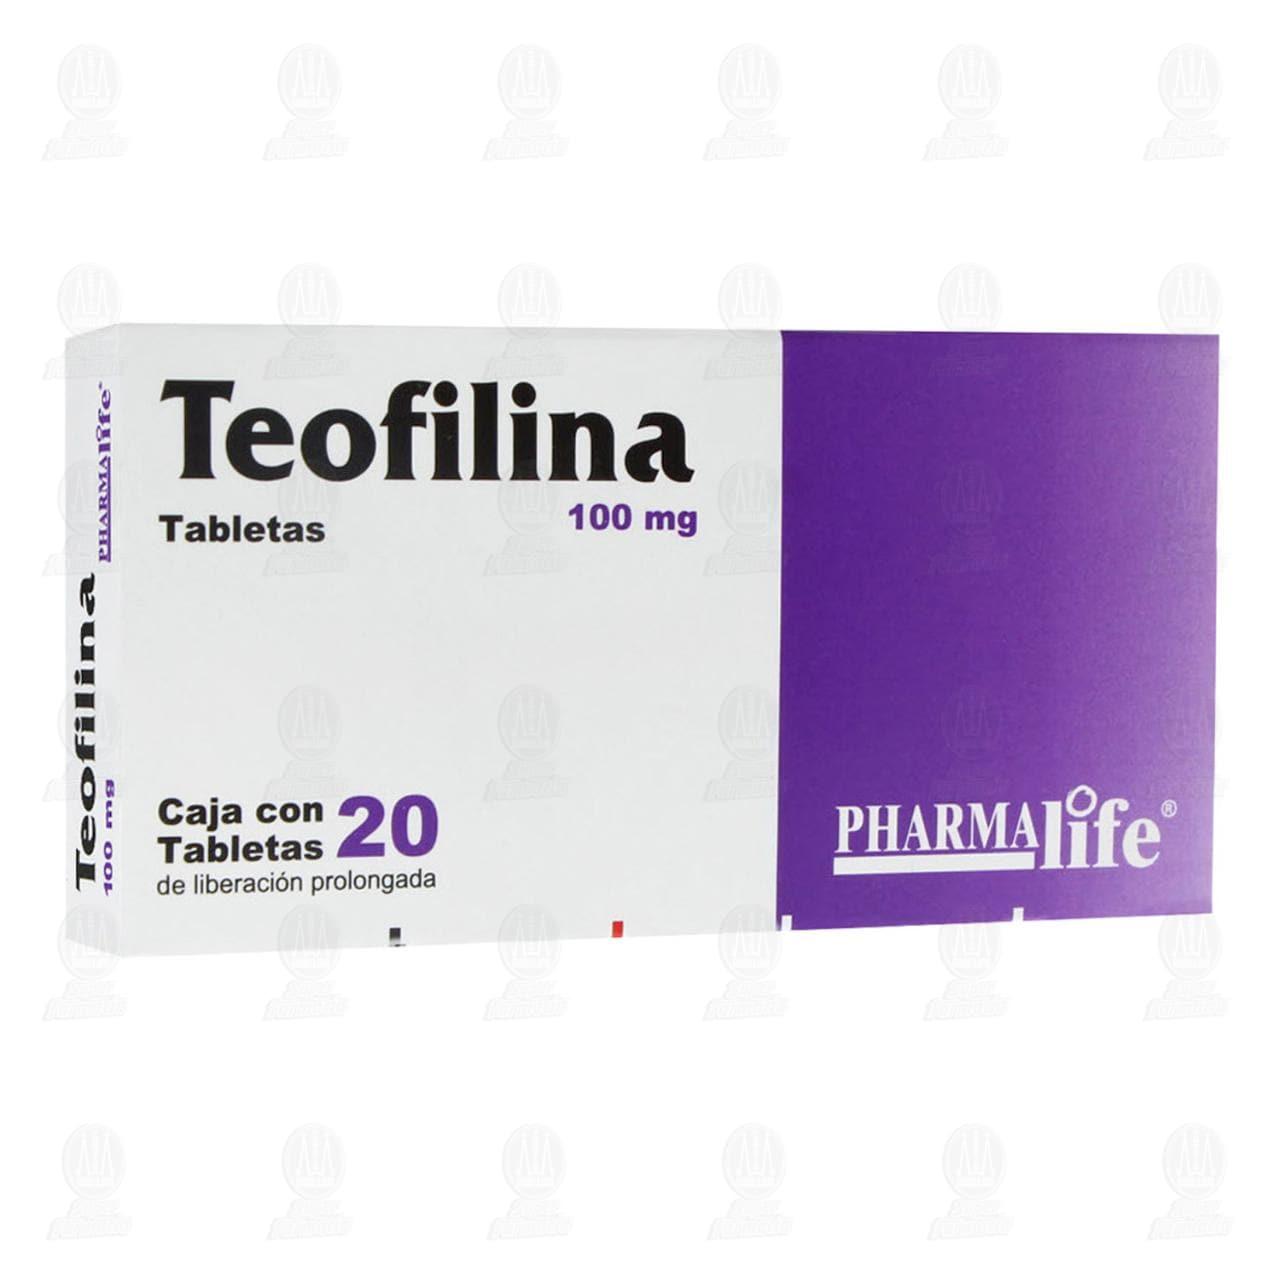 Comprar Teofilina 100mg 20 Tabletas Pharmalife en Farmacias Guadalajara